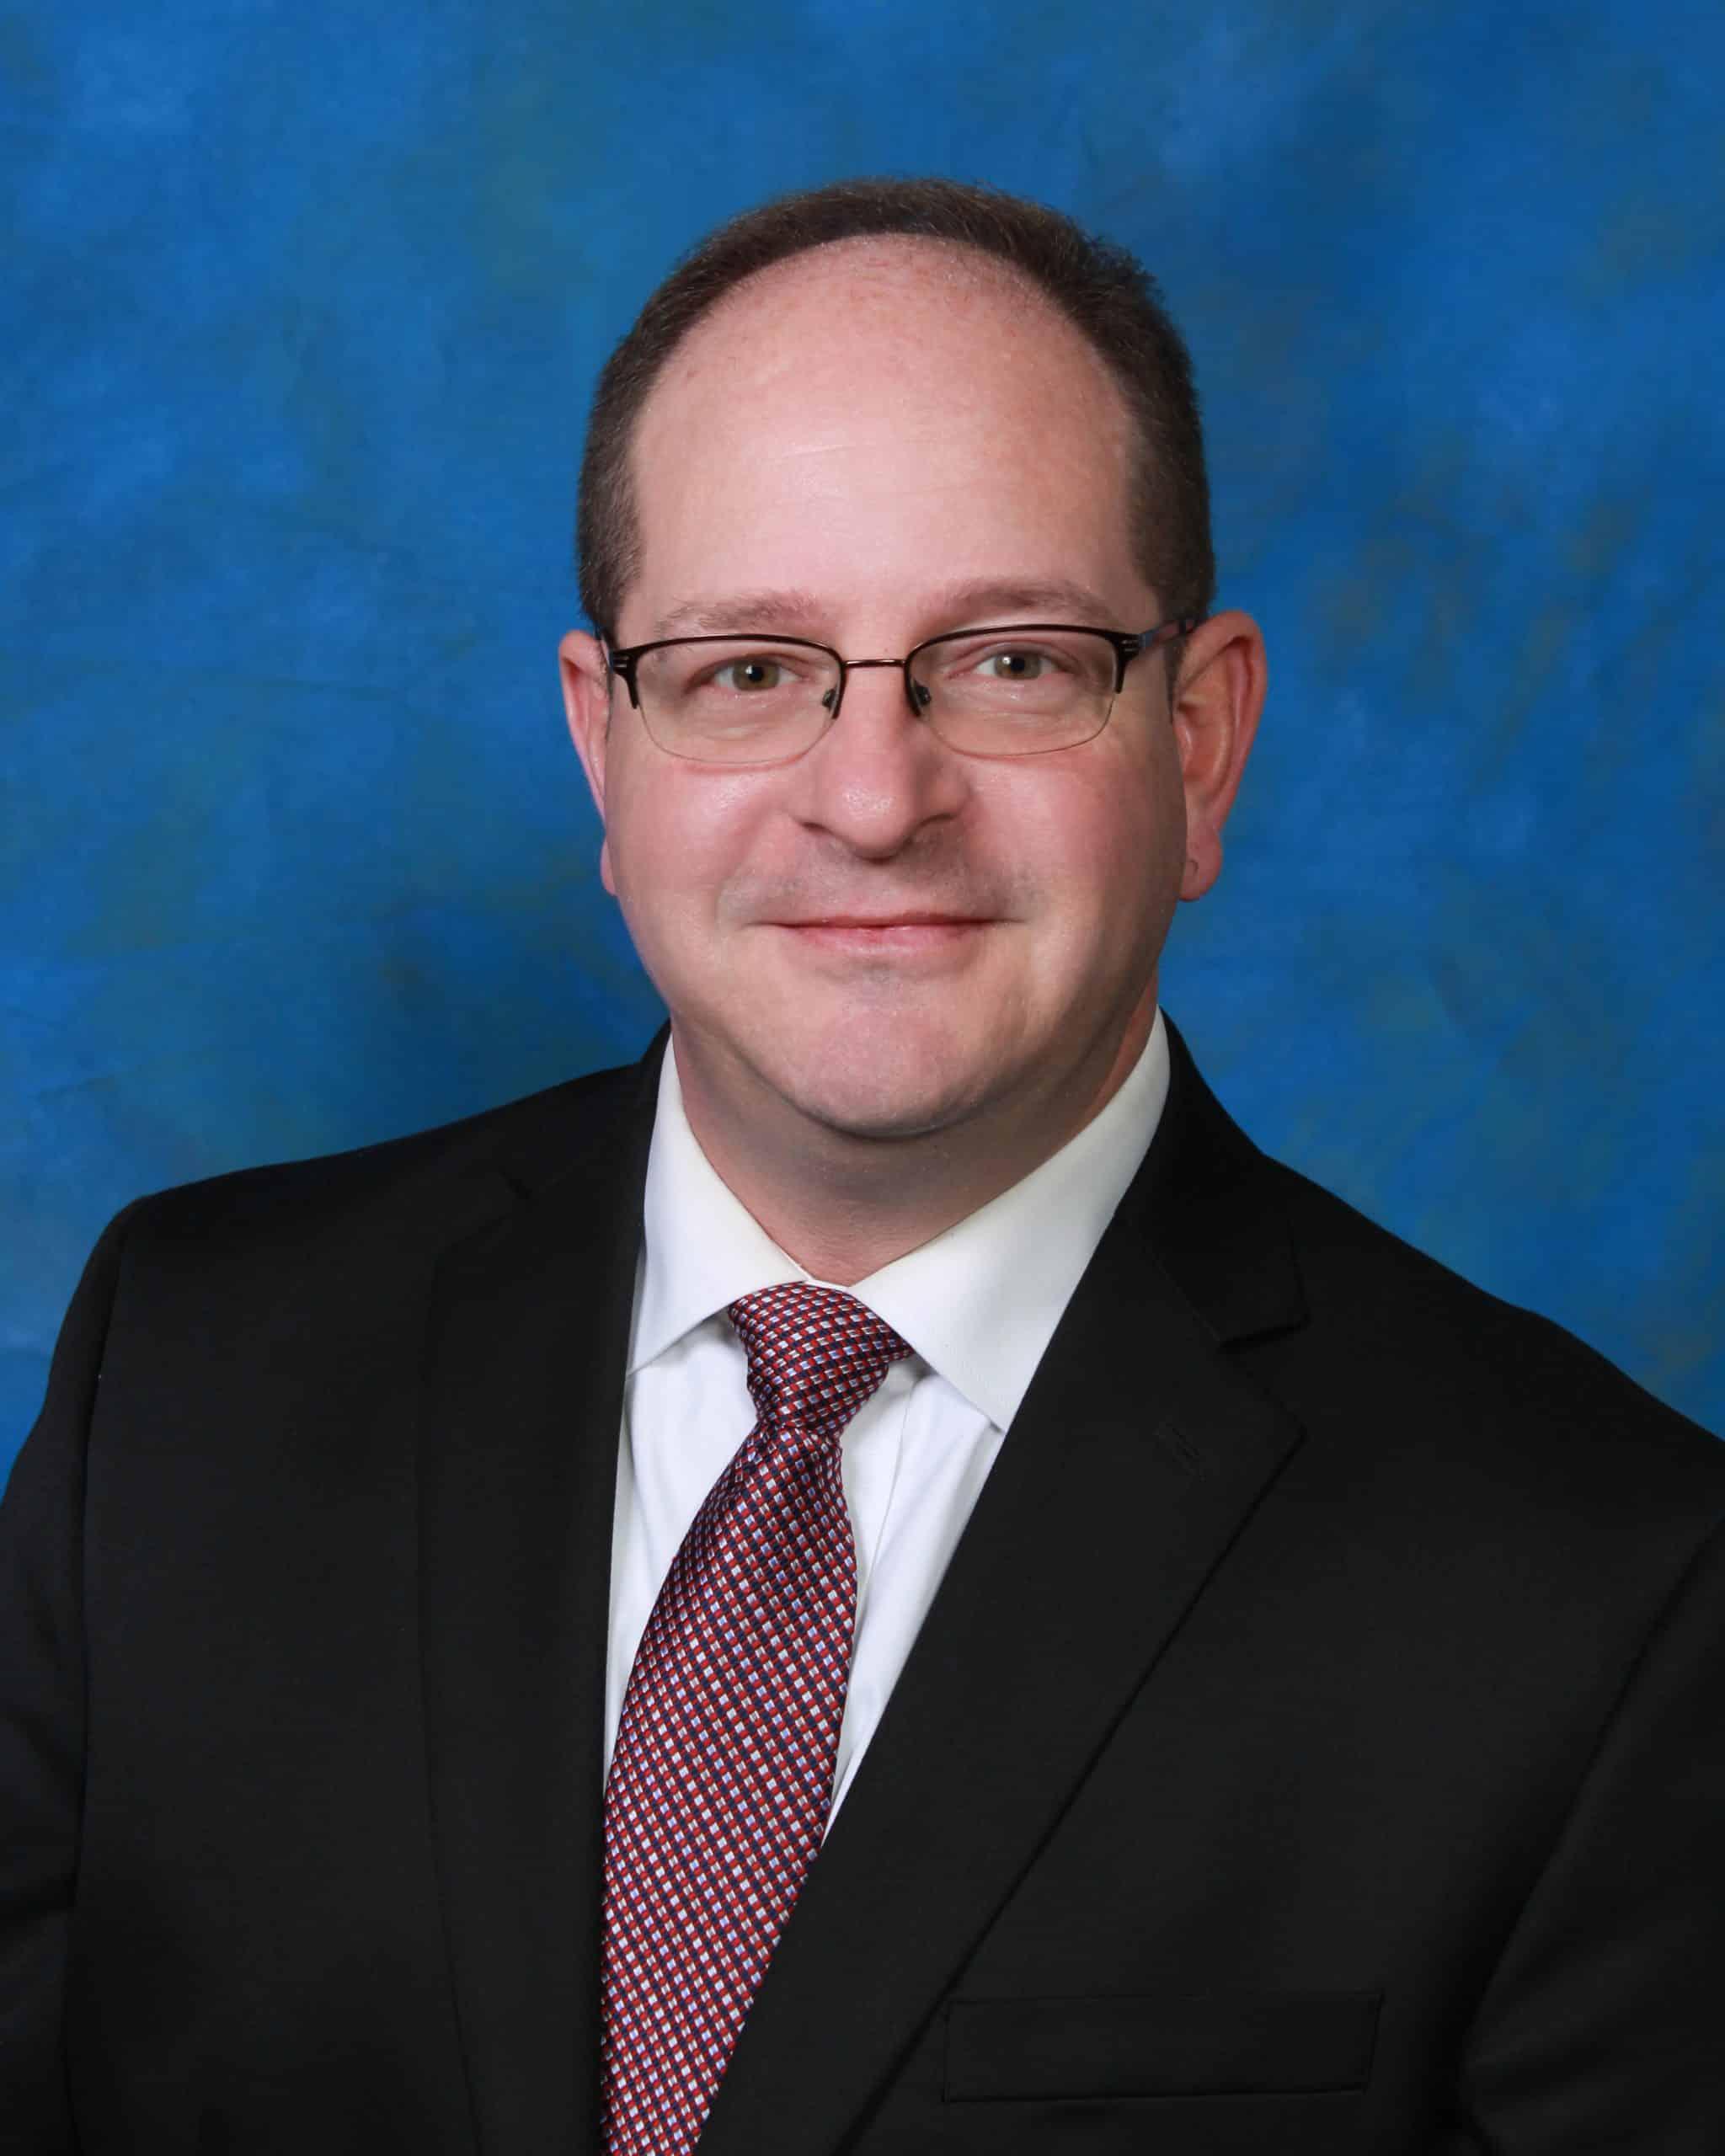 Headshot of Evansville criminal defense attorney Conor O'Daniel of the law firm Foster, O'Daniel, Hambidge & Lynch